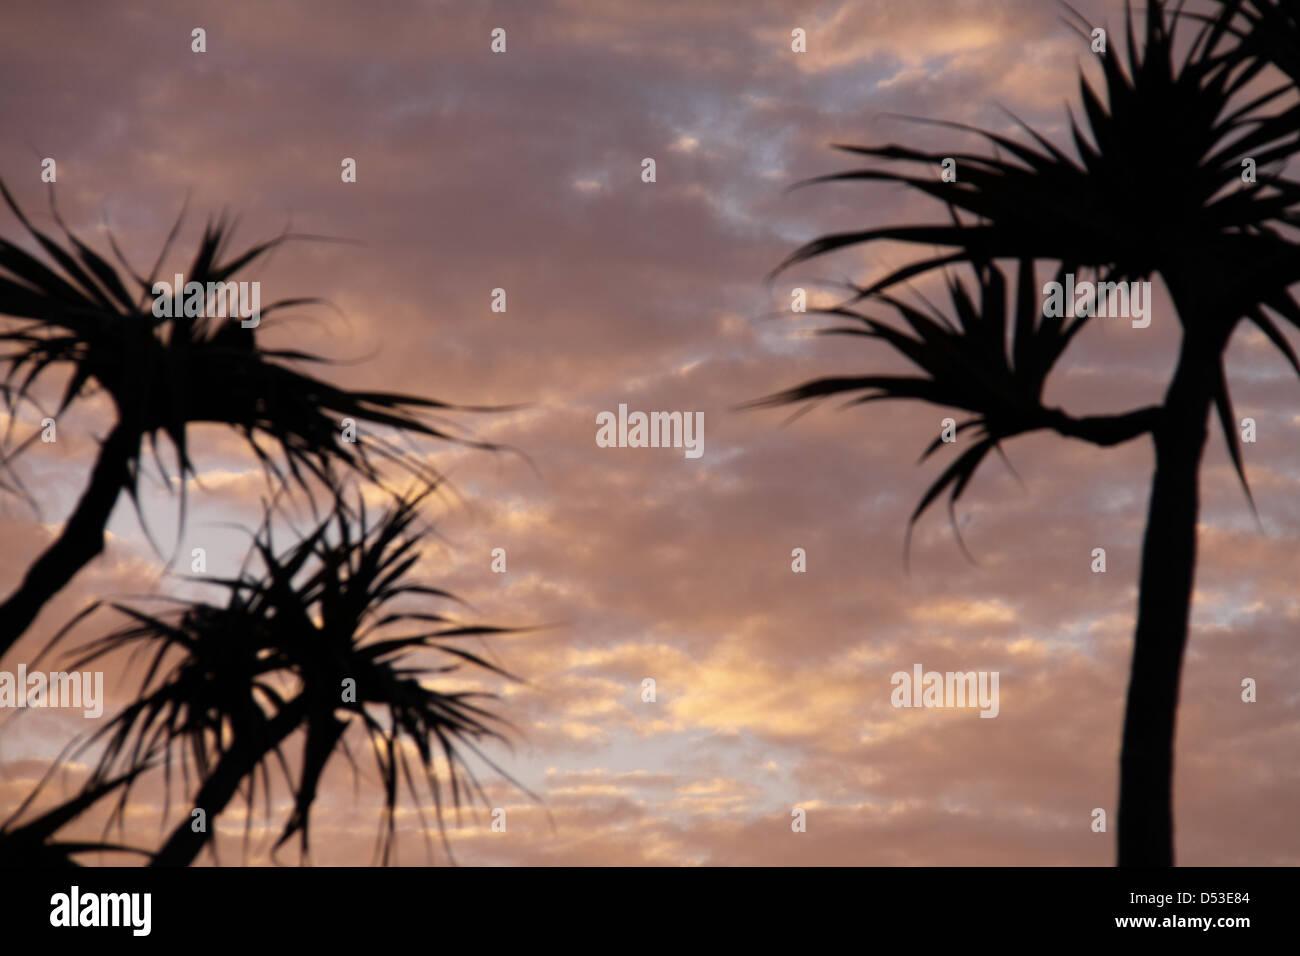 Pandanus Palm Trees (Pandanus Tectorius Australianus) - Stock Image